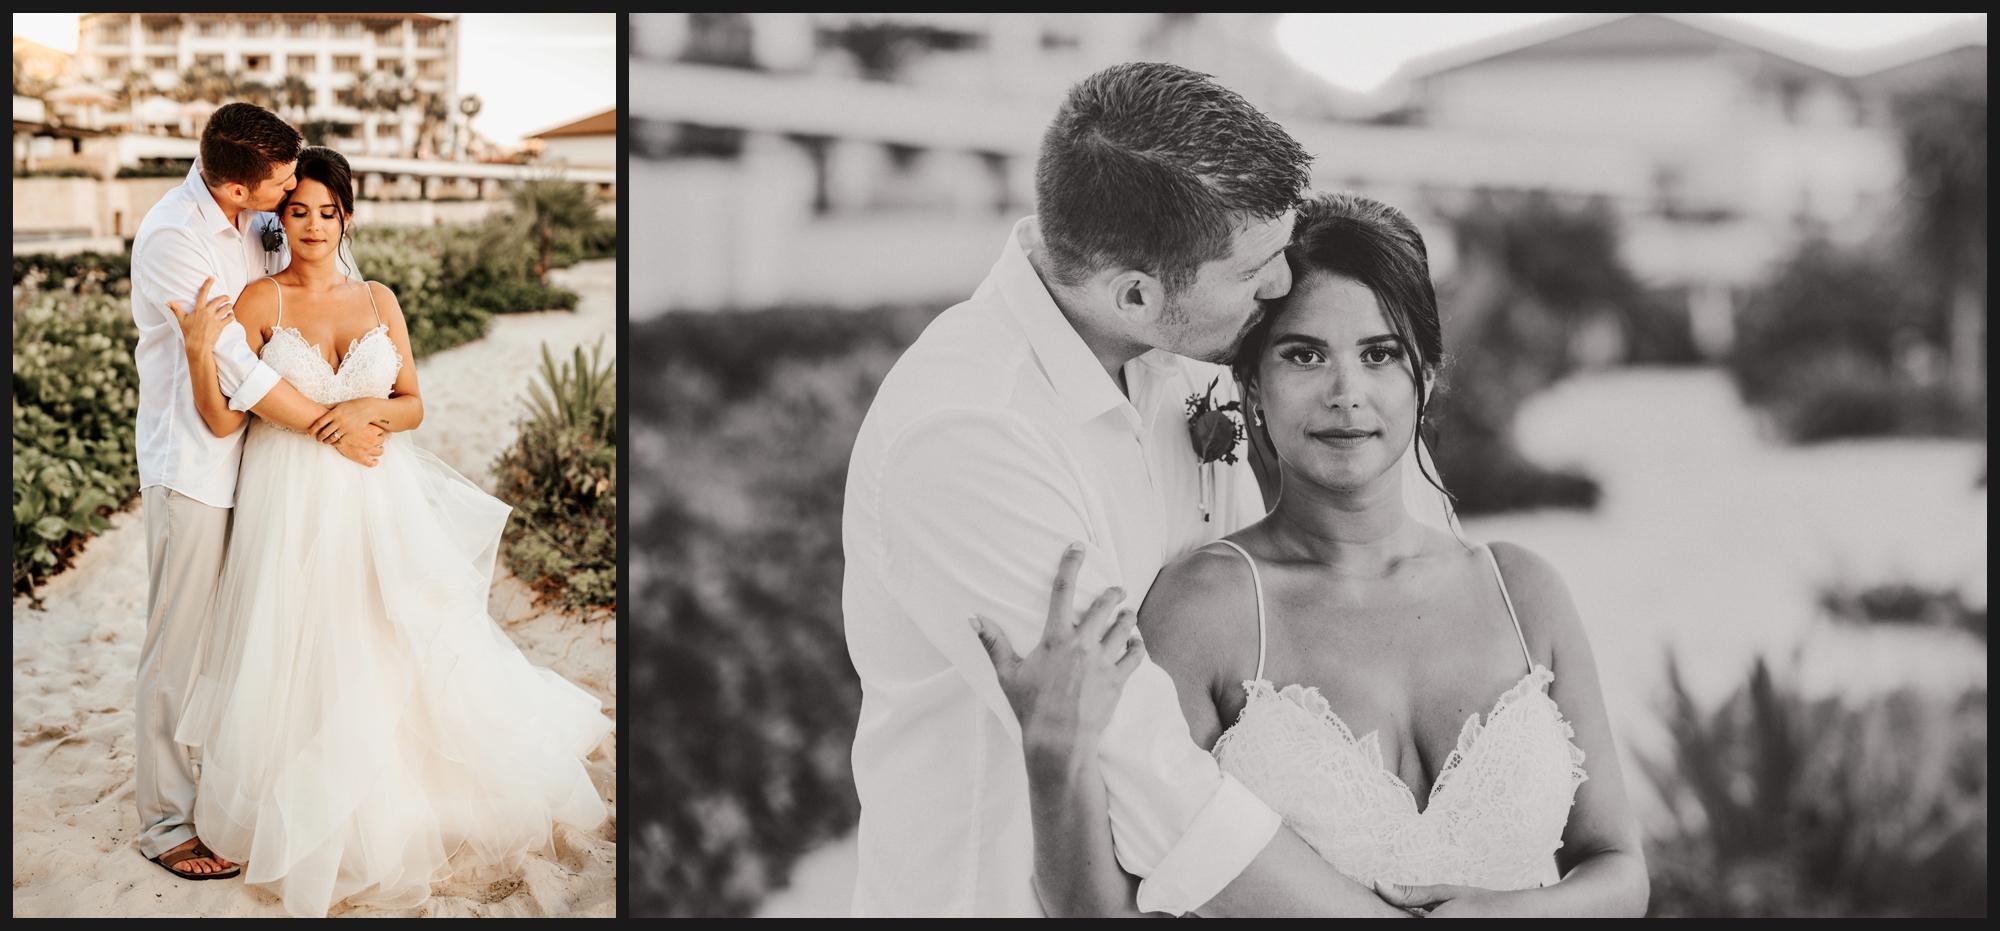 Orlando-Wedding-Photographer-destination-wedding-photographer-florida-wedding-photographer-bohemian-wedding-photographer_0472.jpg